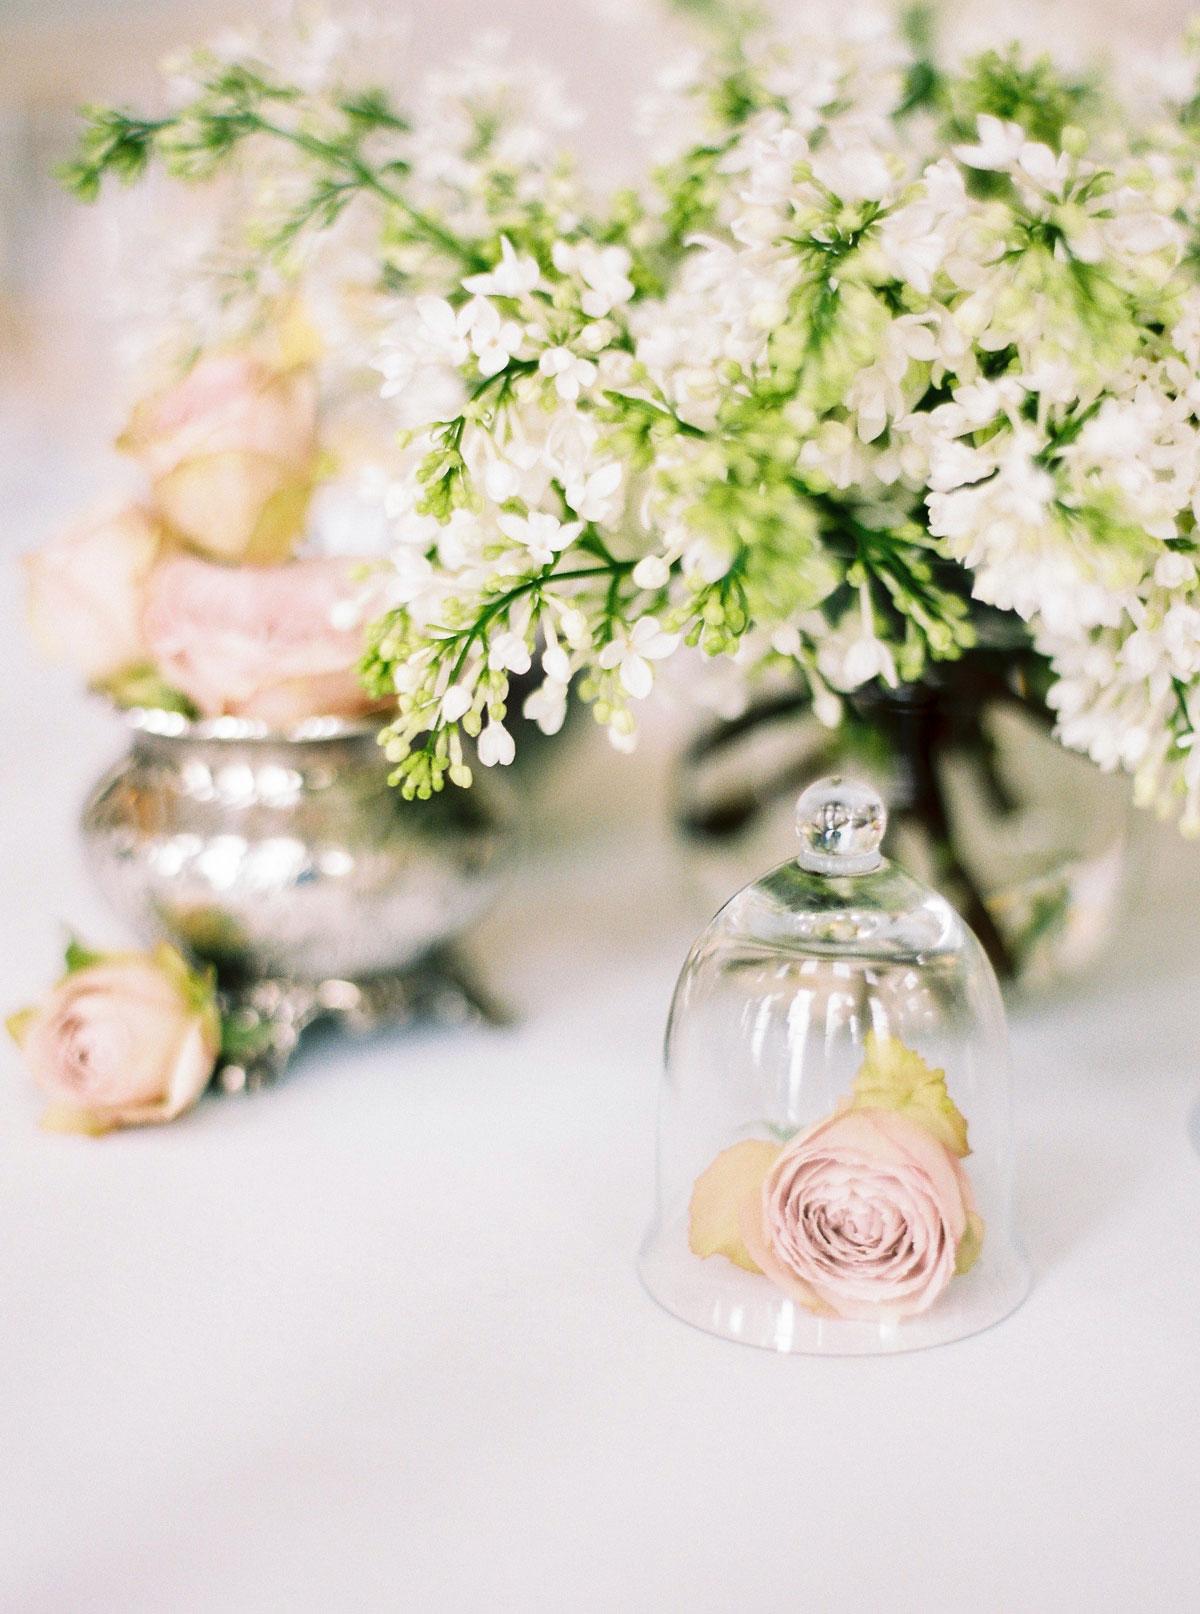 sarah-harper-floral-design-luxury-wedding-florist-flowers-oxfordshite-cotsworlds-gallery-Lucy_Davenport_Photography_Aynhoe_SpringSummer-009